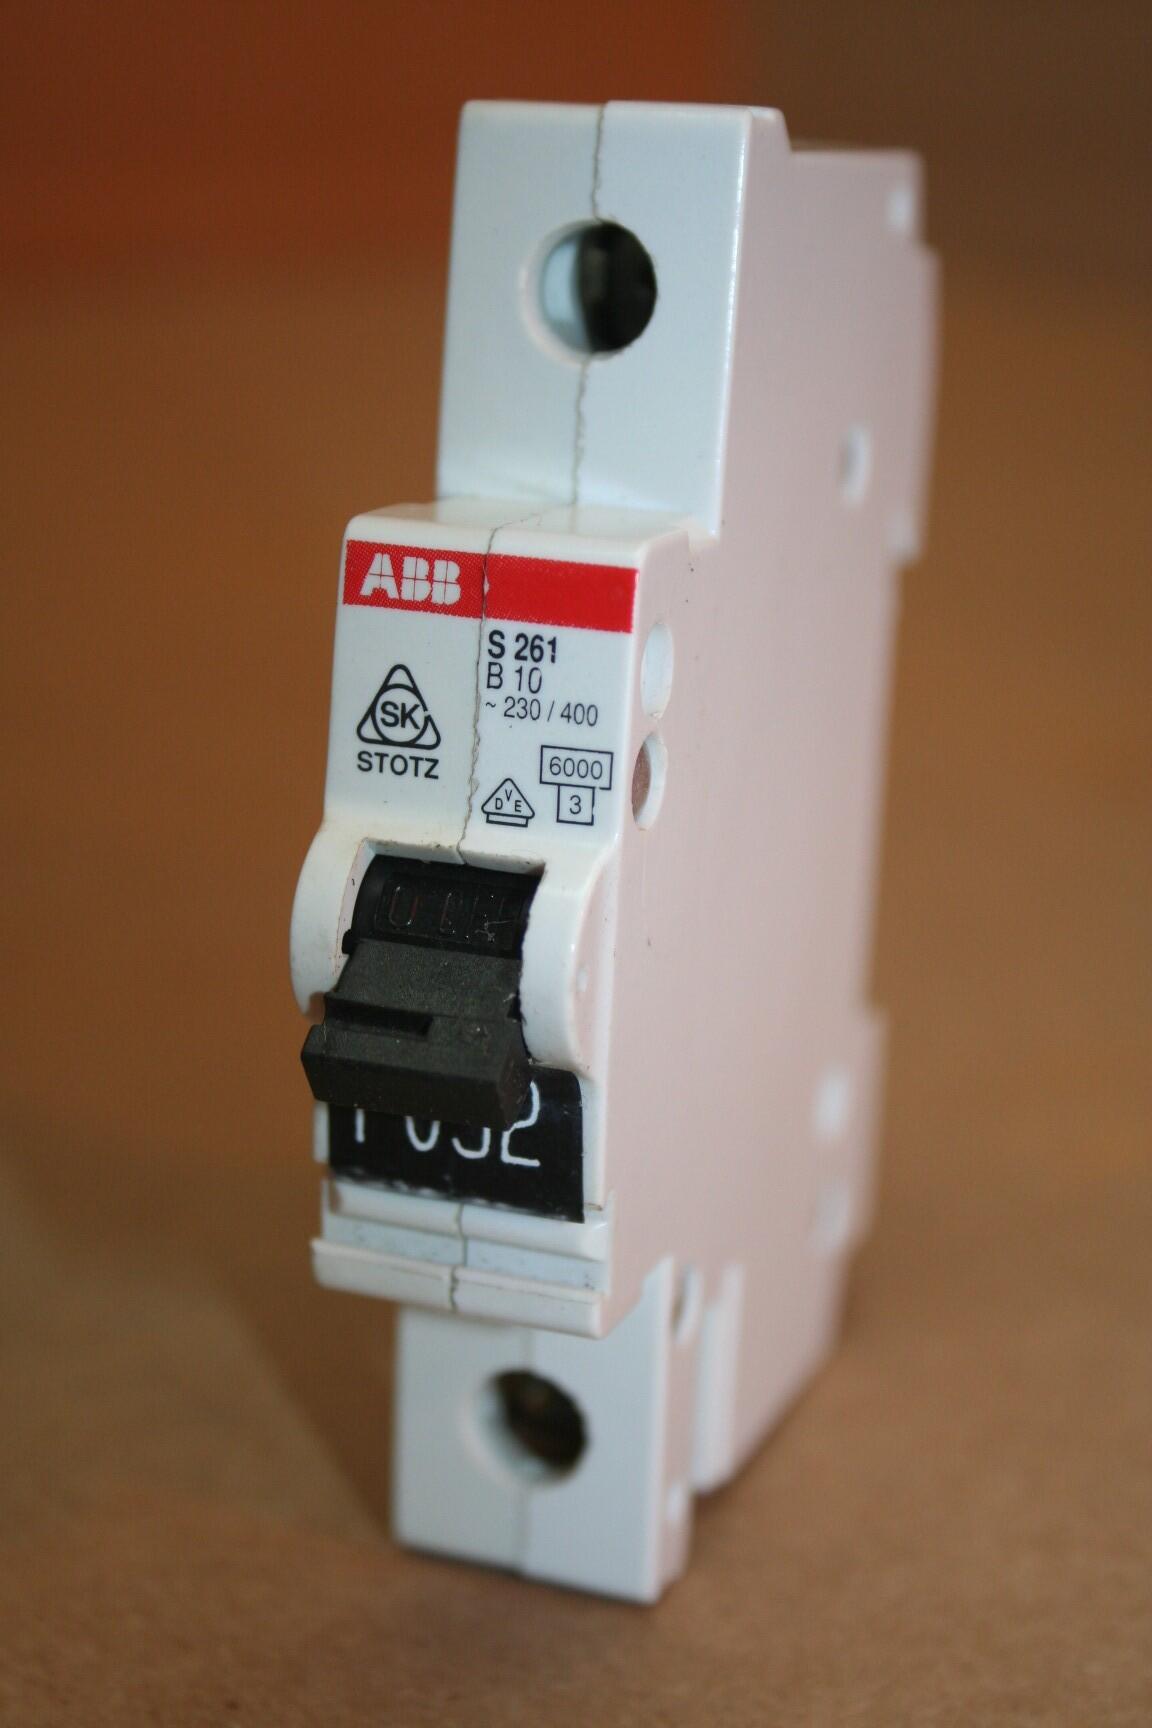 Abb 10 Amp Circuit Breaker S261b10 Used 19879 Ebay